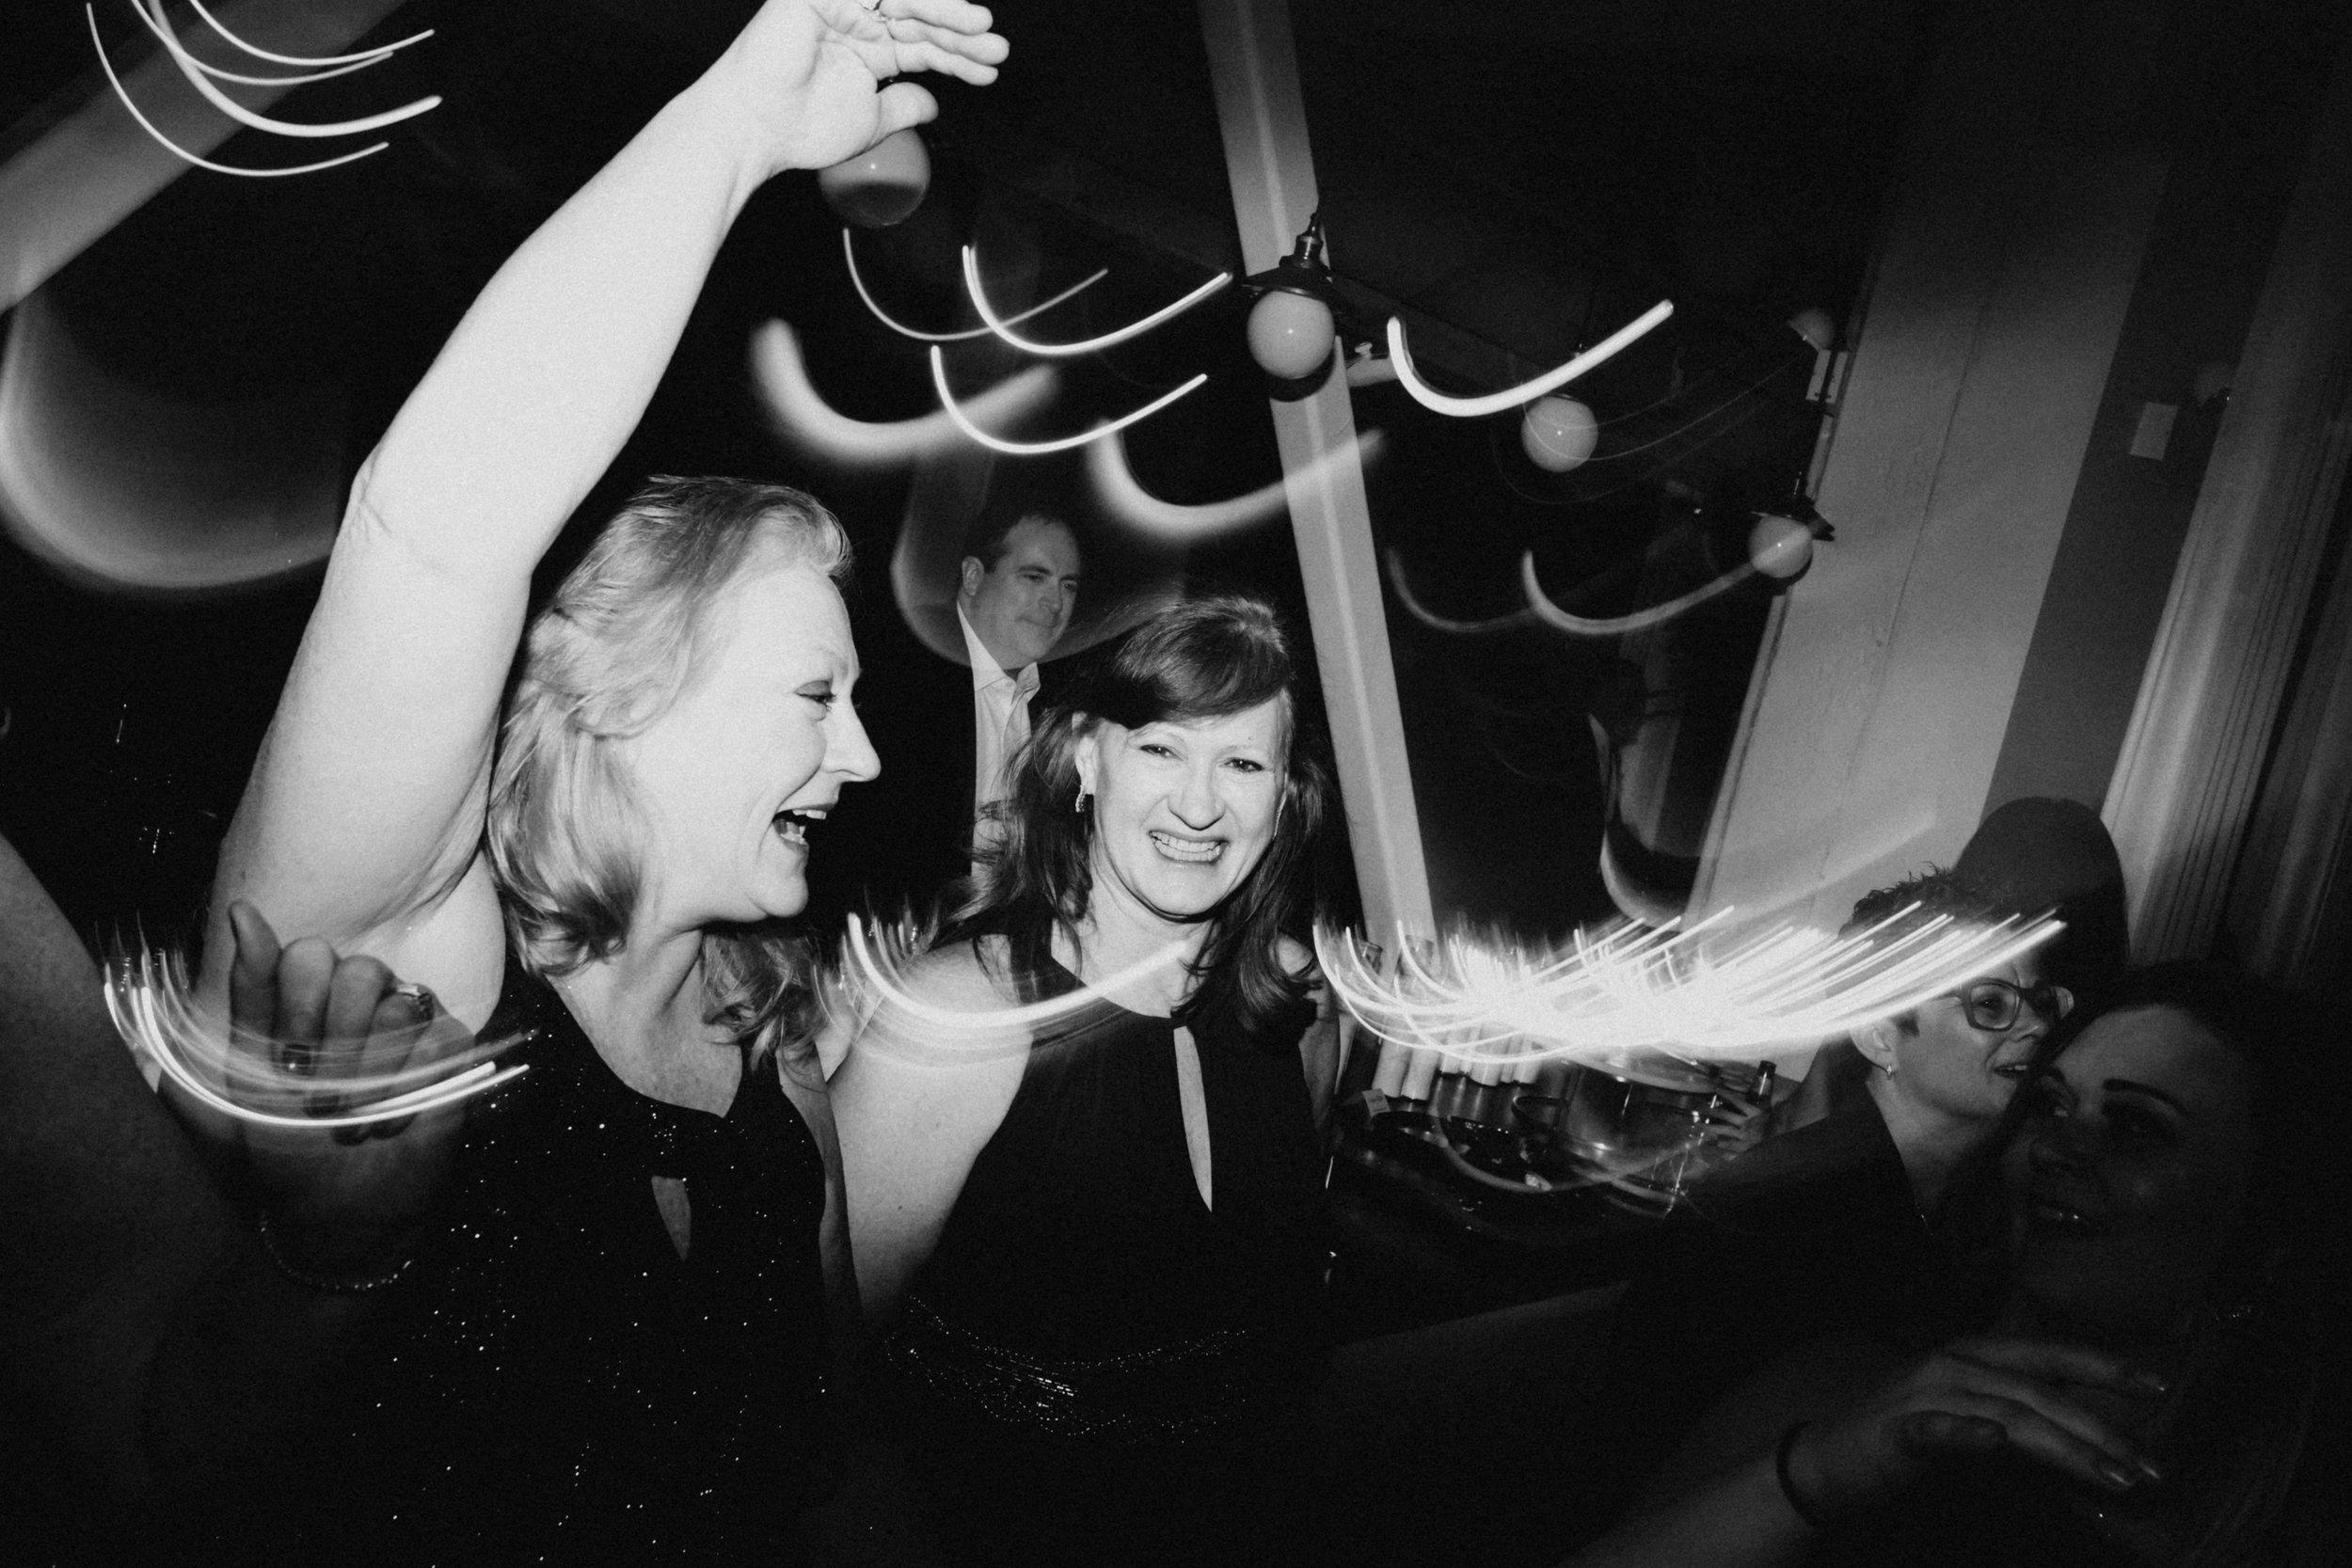 authentic wedding photographers chicago illinois